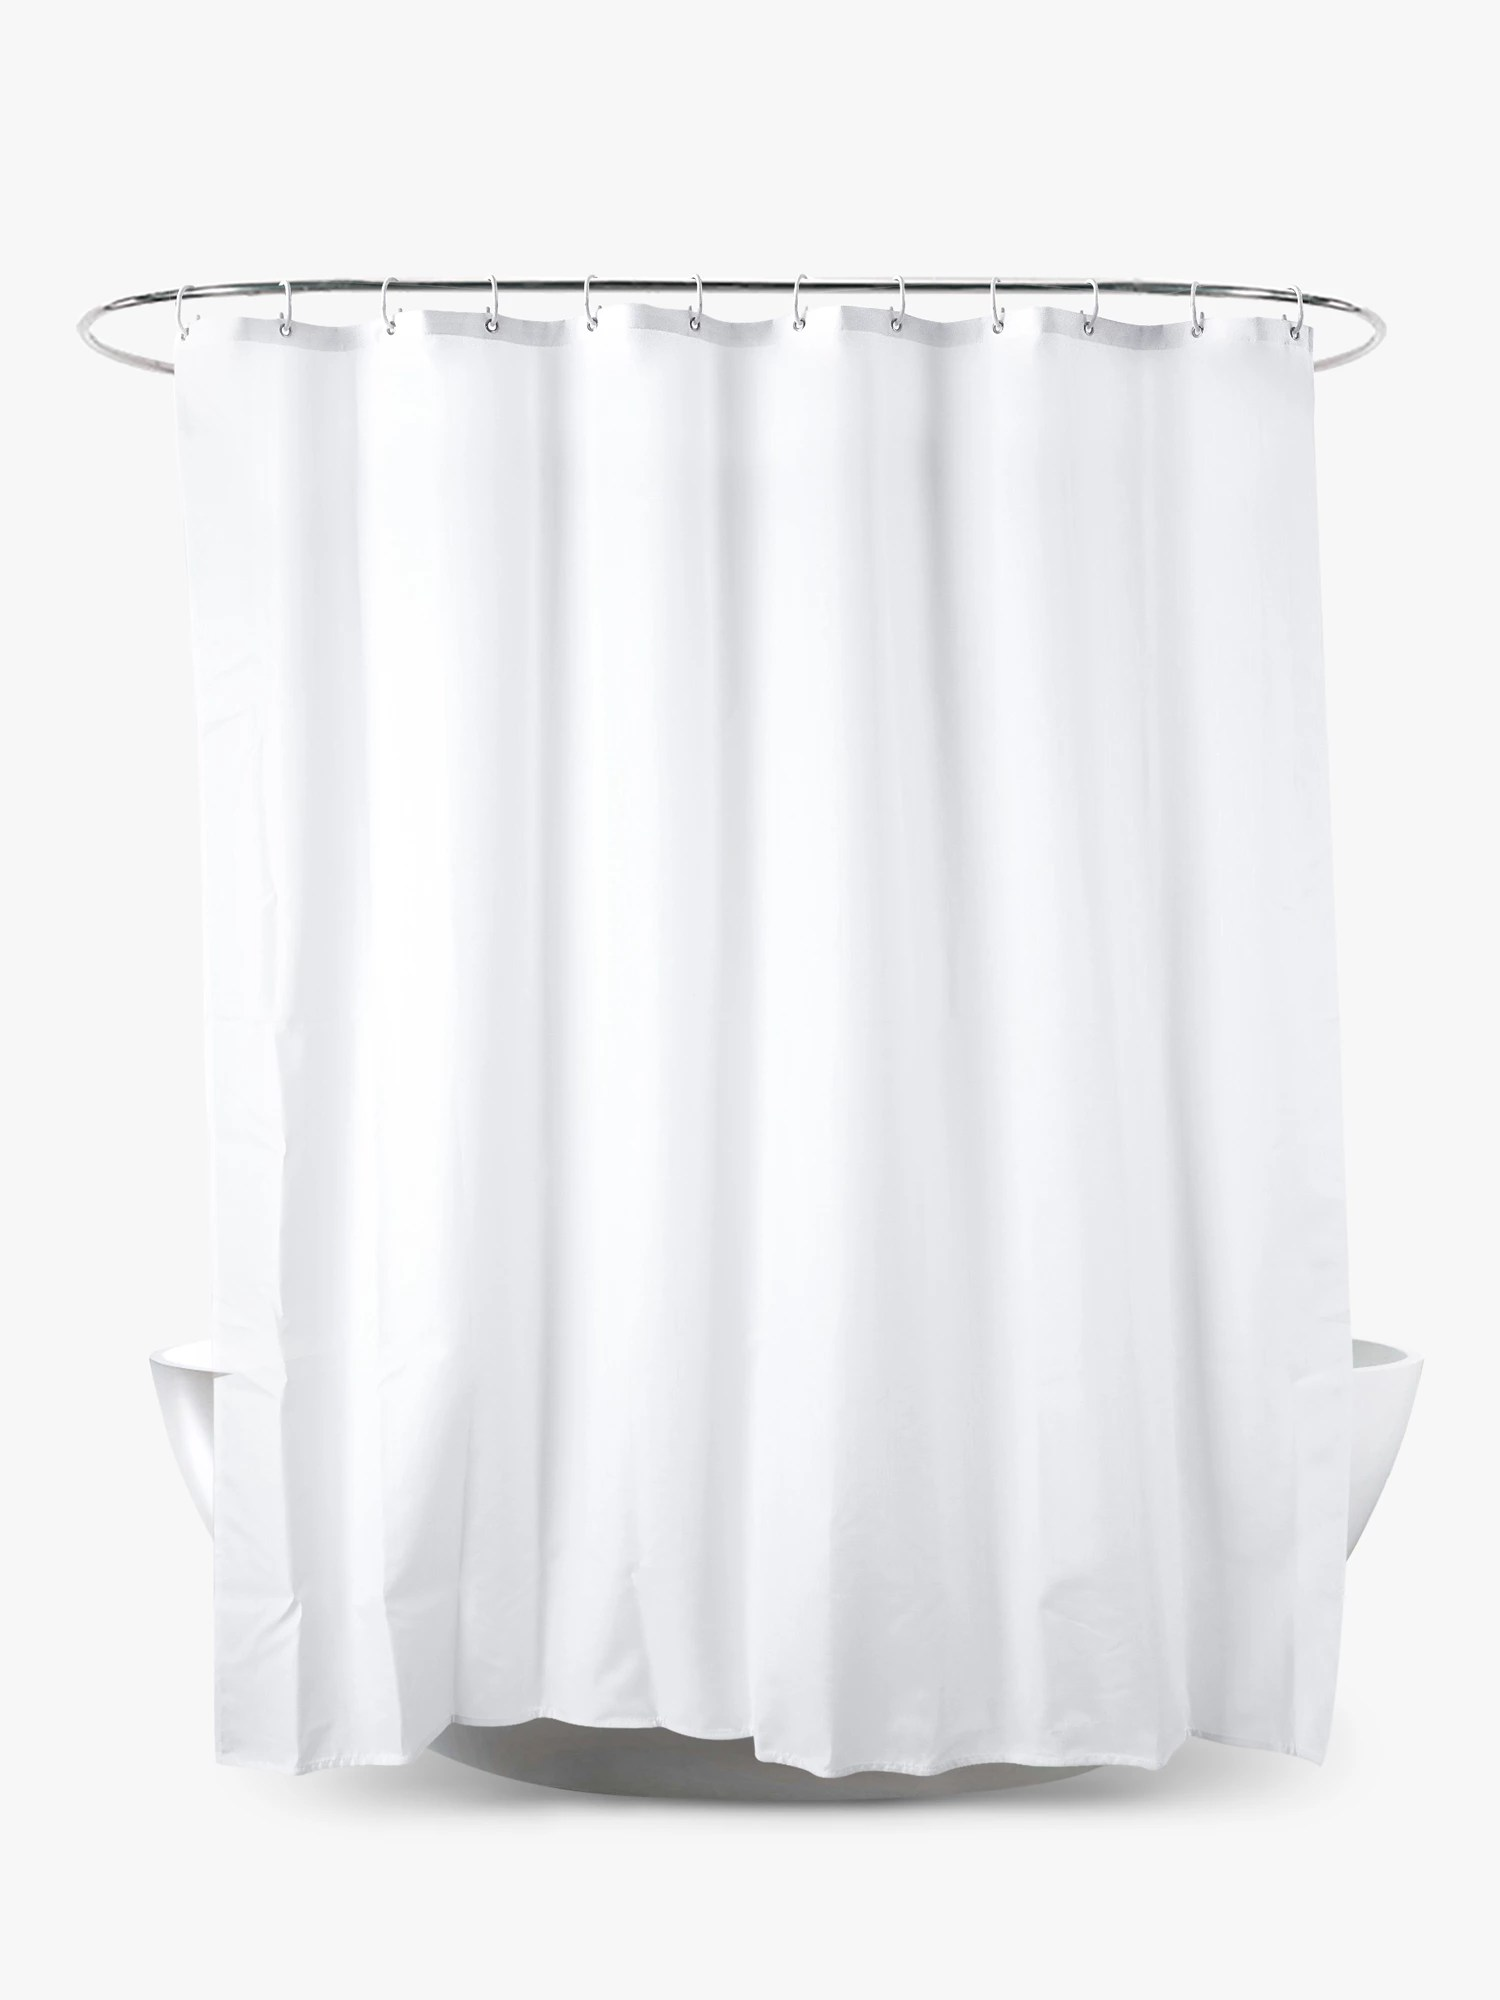 john lewis partners textured slub shower curtain extra long